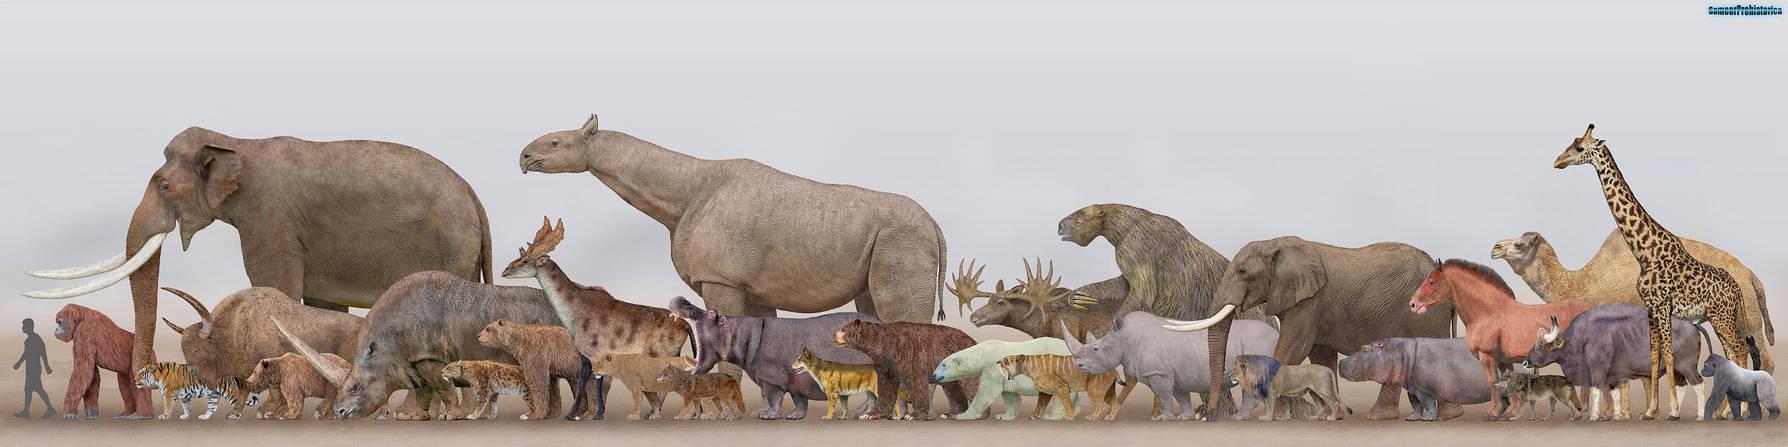 Megafauna - Mammals